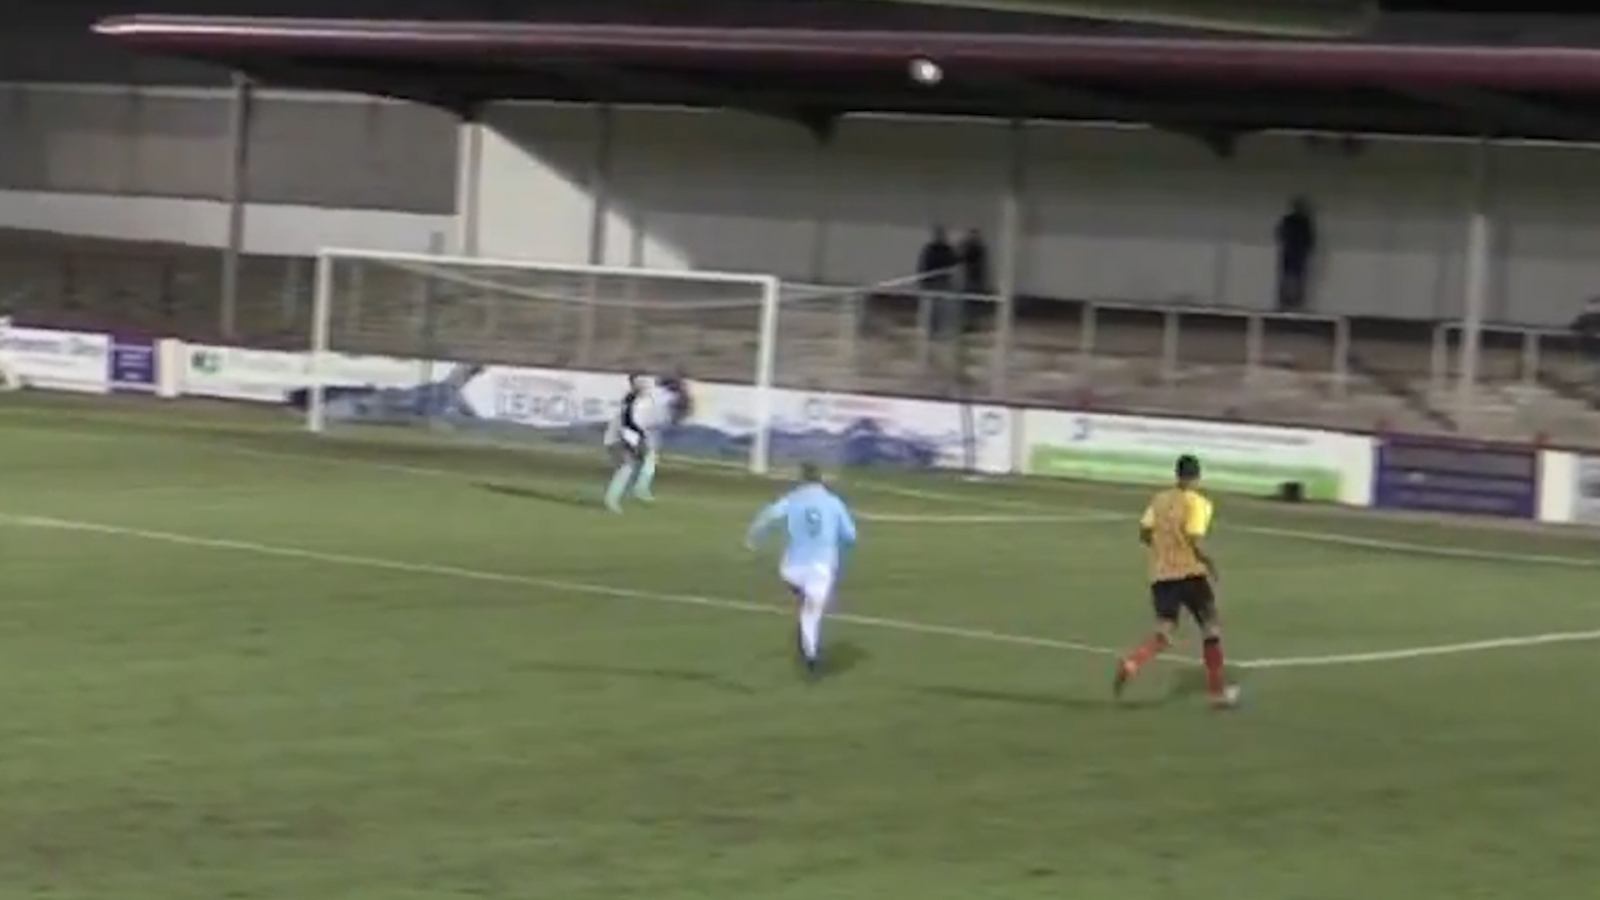 Ben Richards-Everton scores spectacular own goal for Partick Thistle